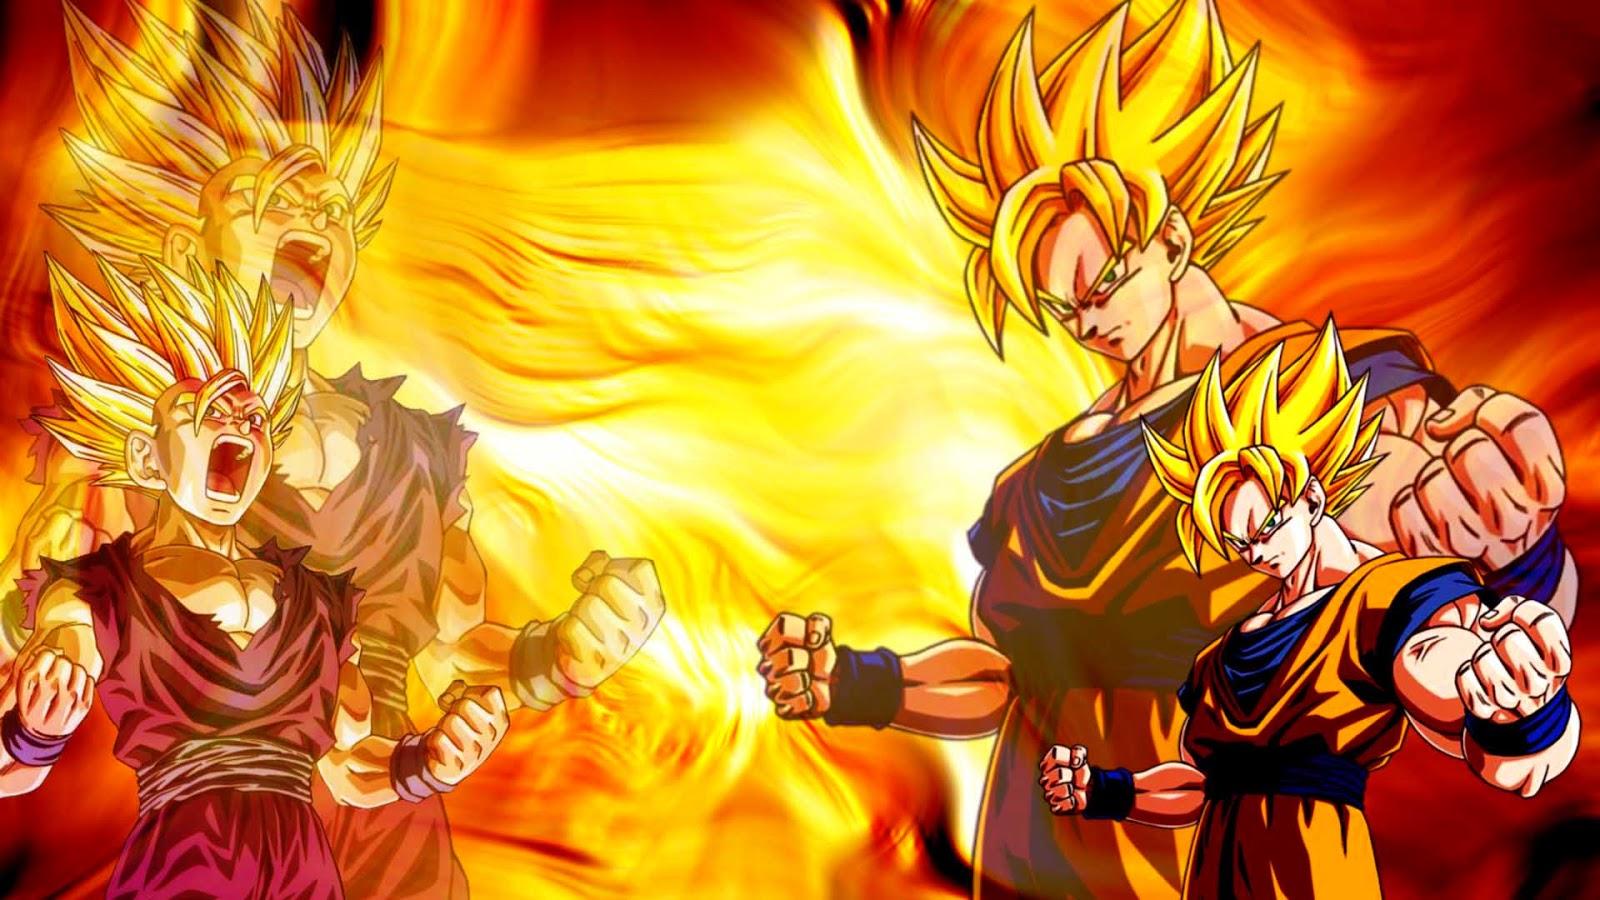 Goku And Gohan Super Saiyan Wallpaper